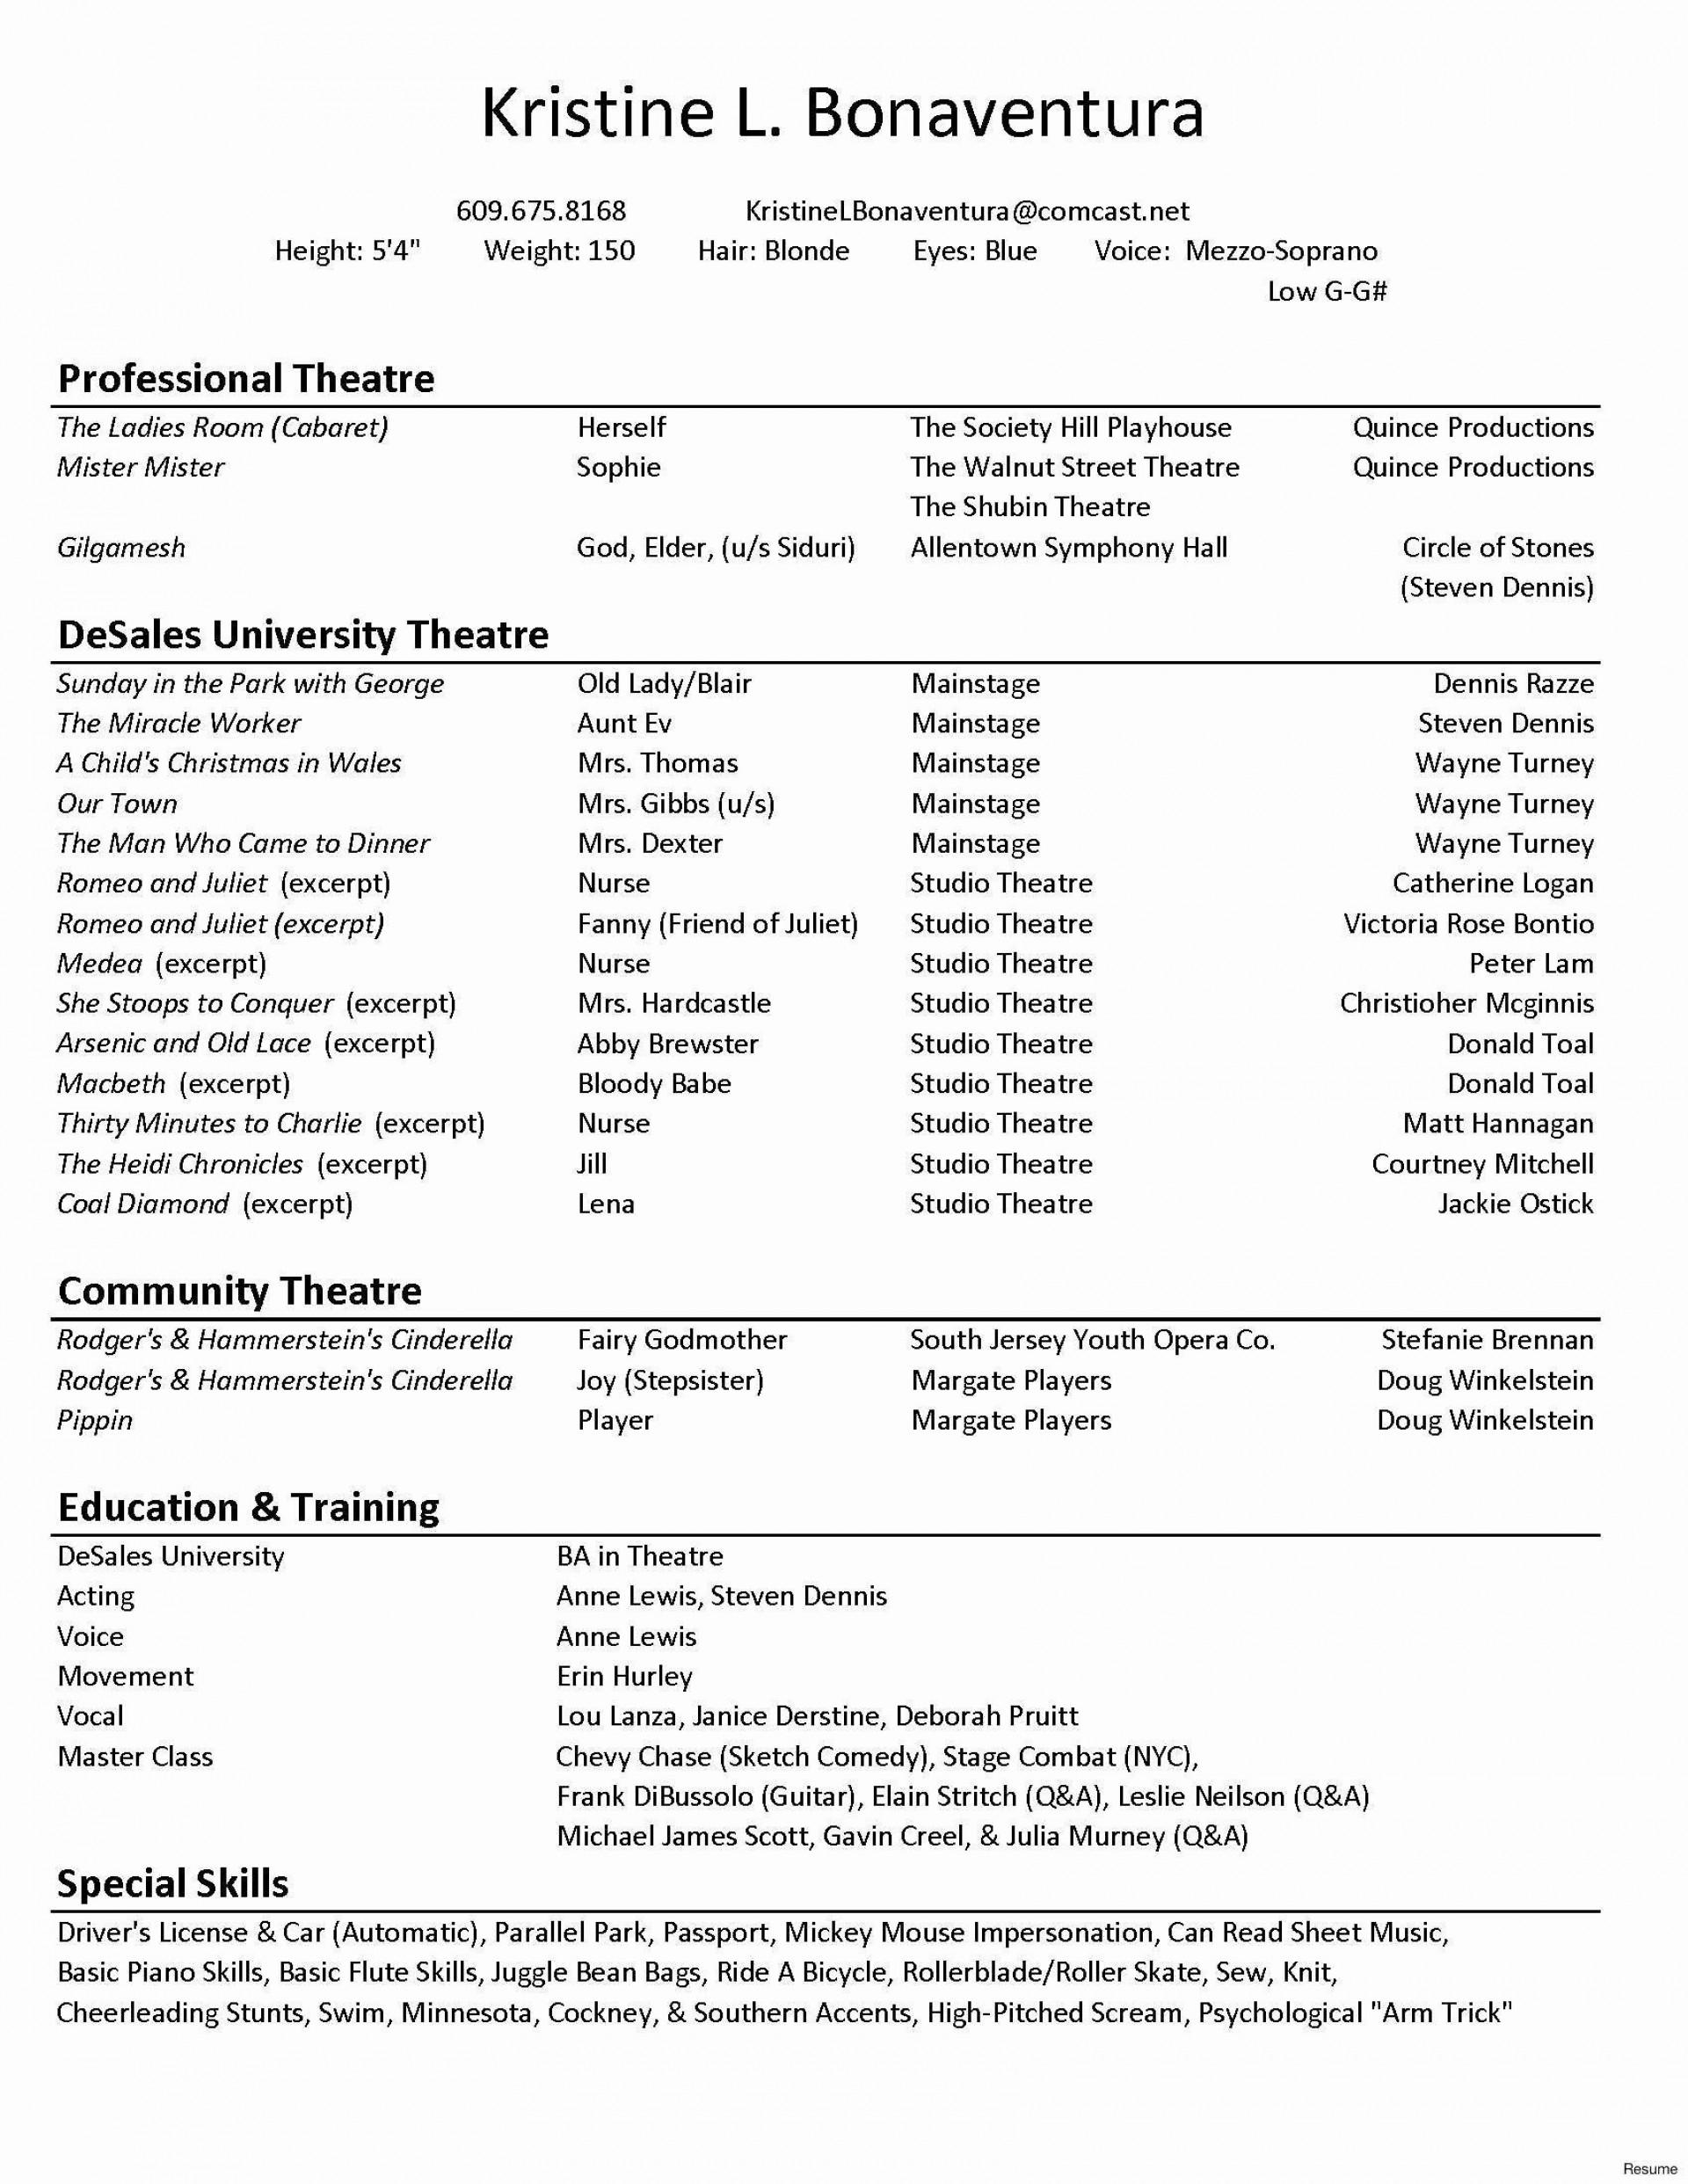 005 Sensational Technical Theatre Resume Template Concept  Google Doc Tech1920